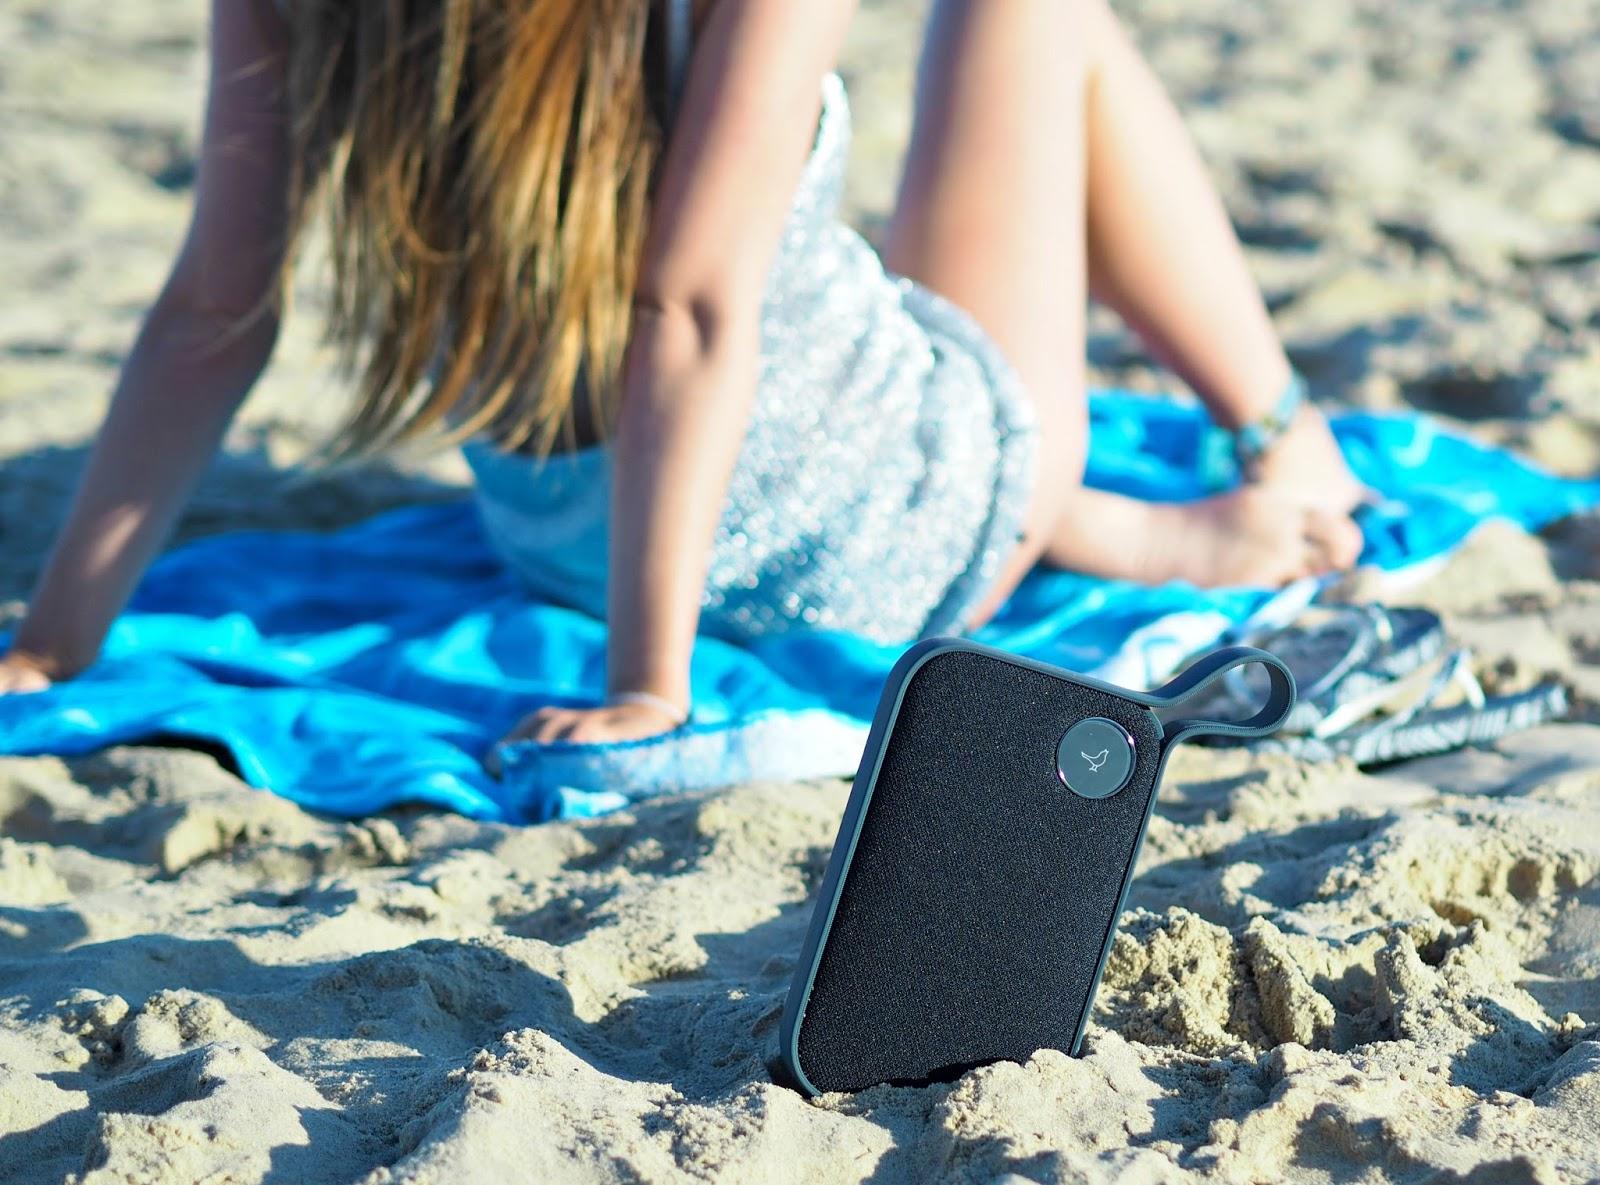 libratone speaker review, beach speaker